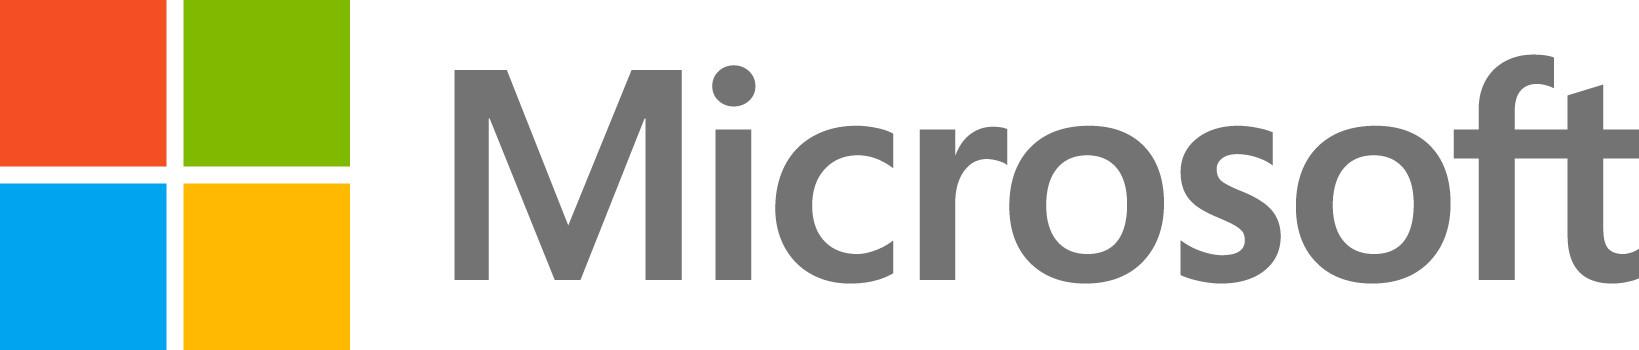 1379415601_microsoftlogo.jpg